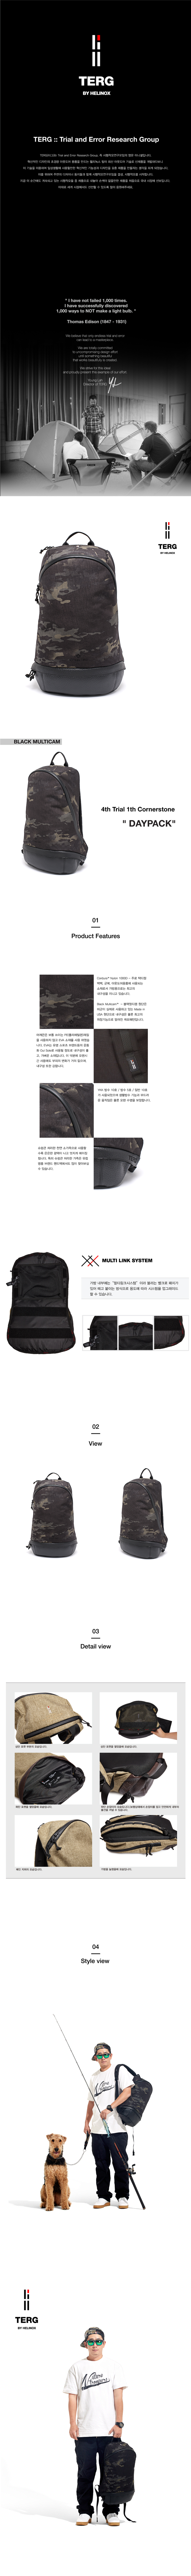 20170511-Daypack---balck-multicam-상세페이지1.jpg